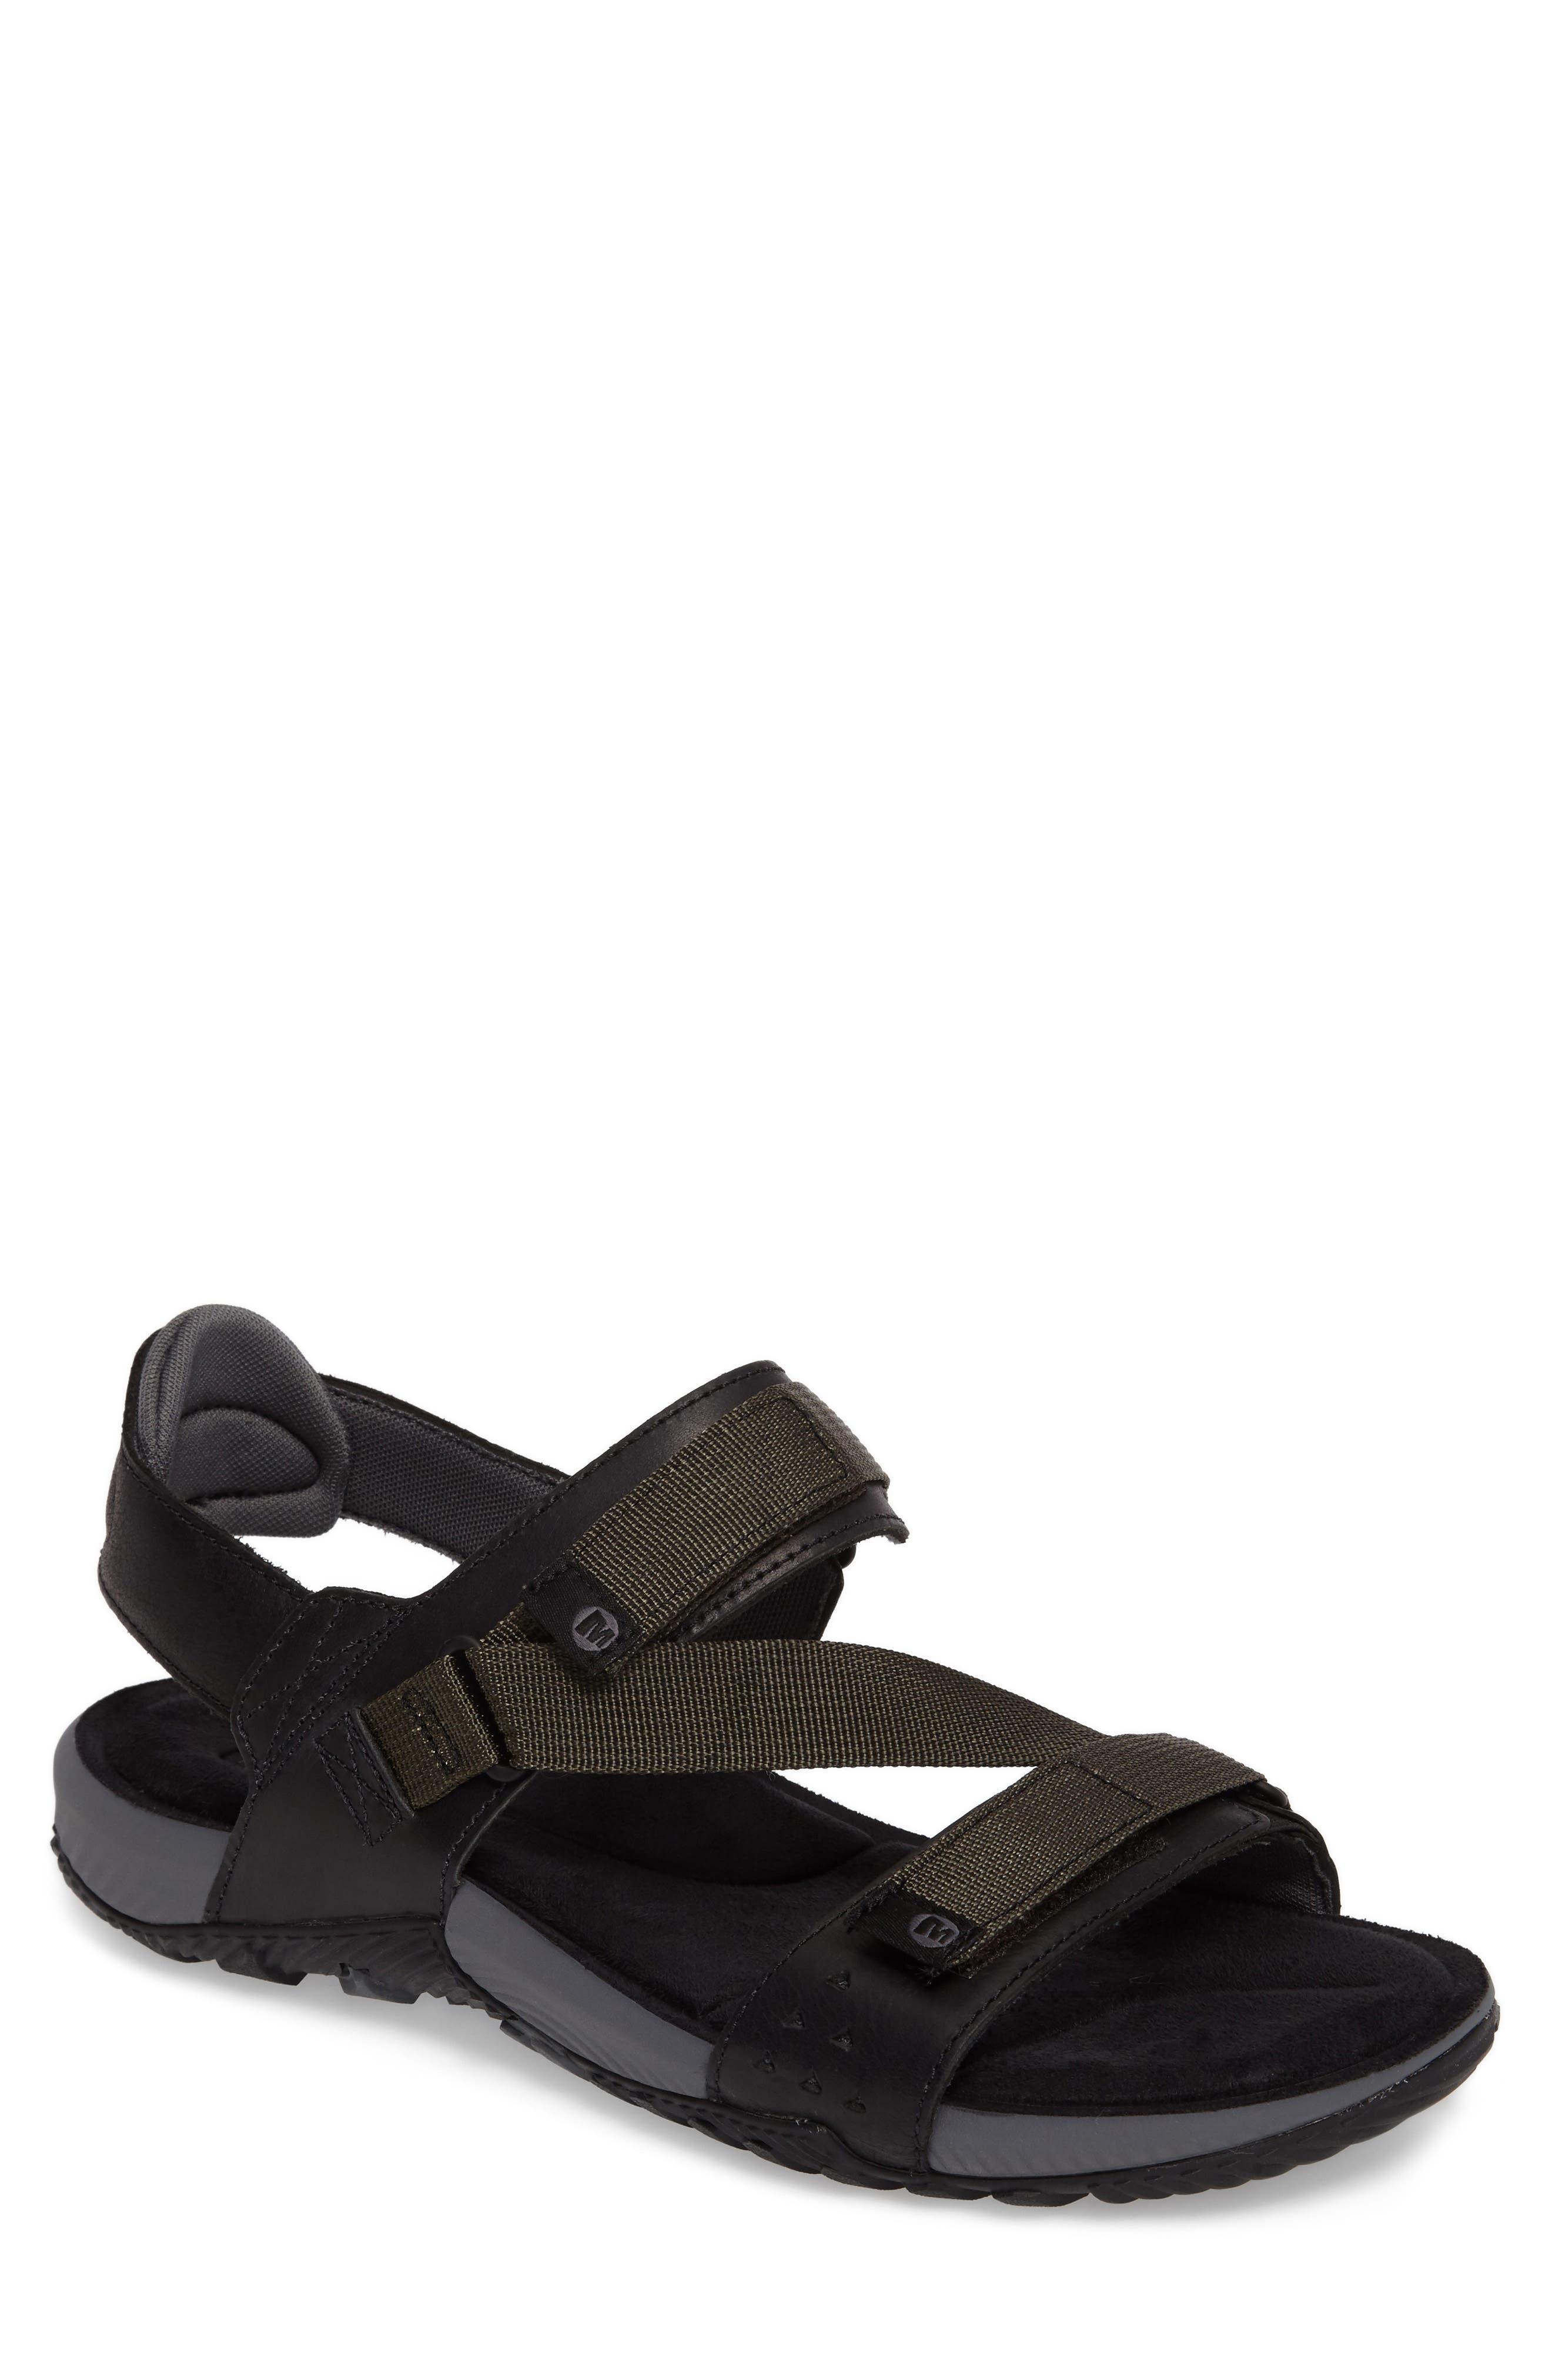 Terrant Sandal,                         Main,                         color, 001